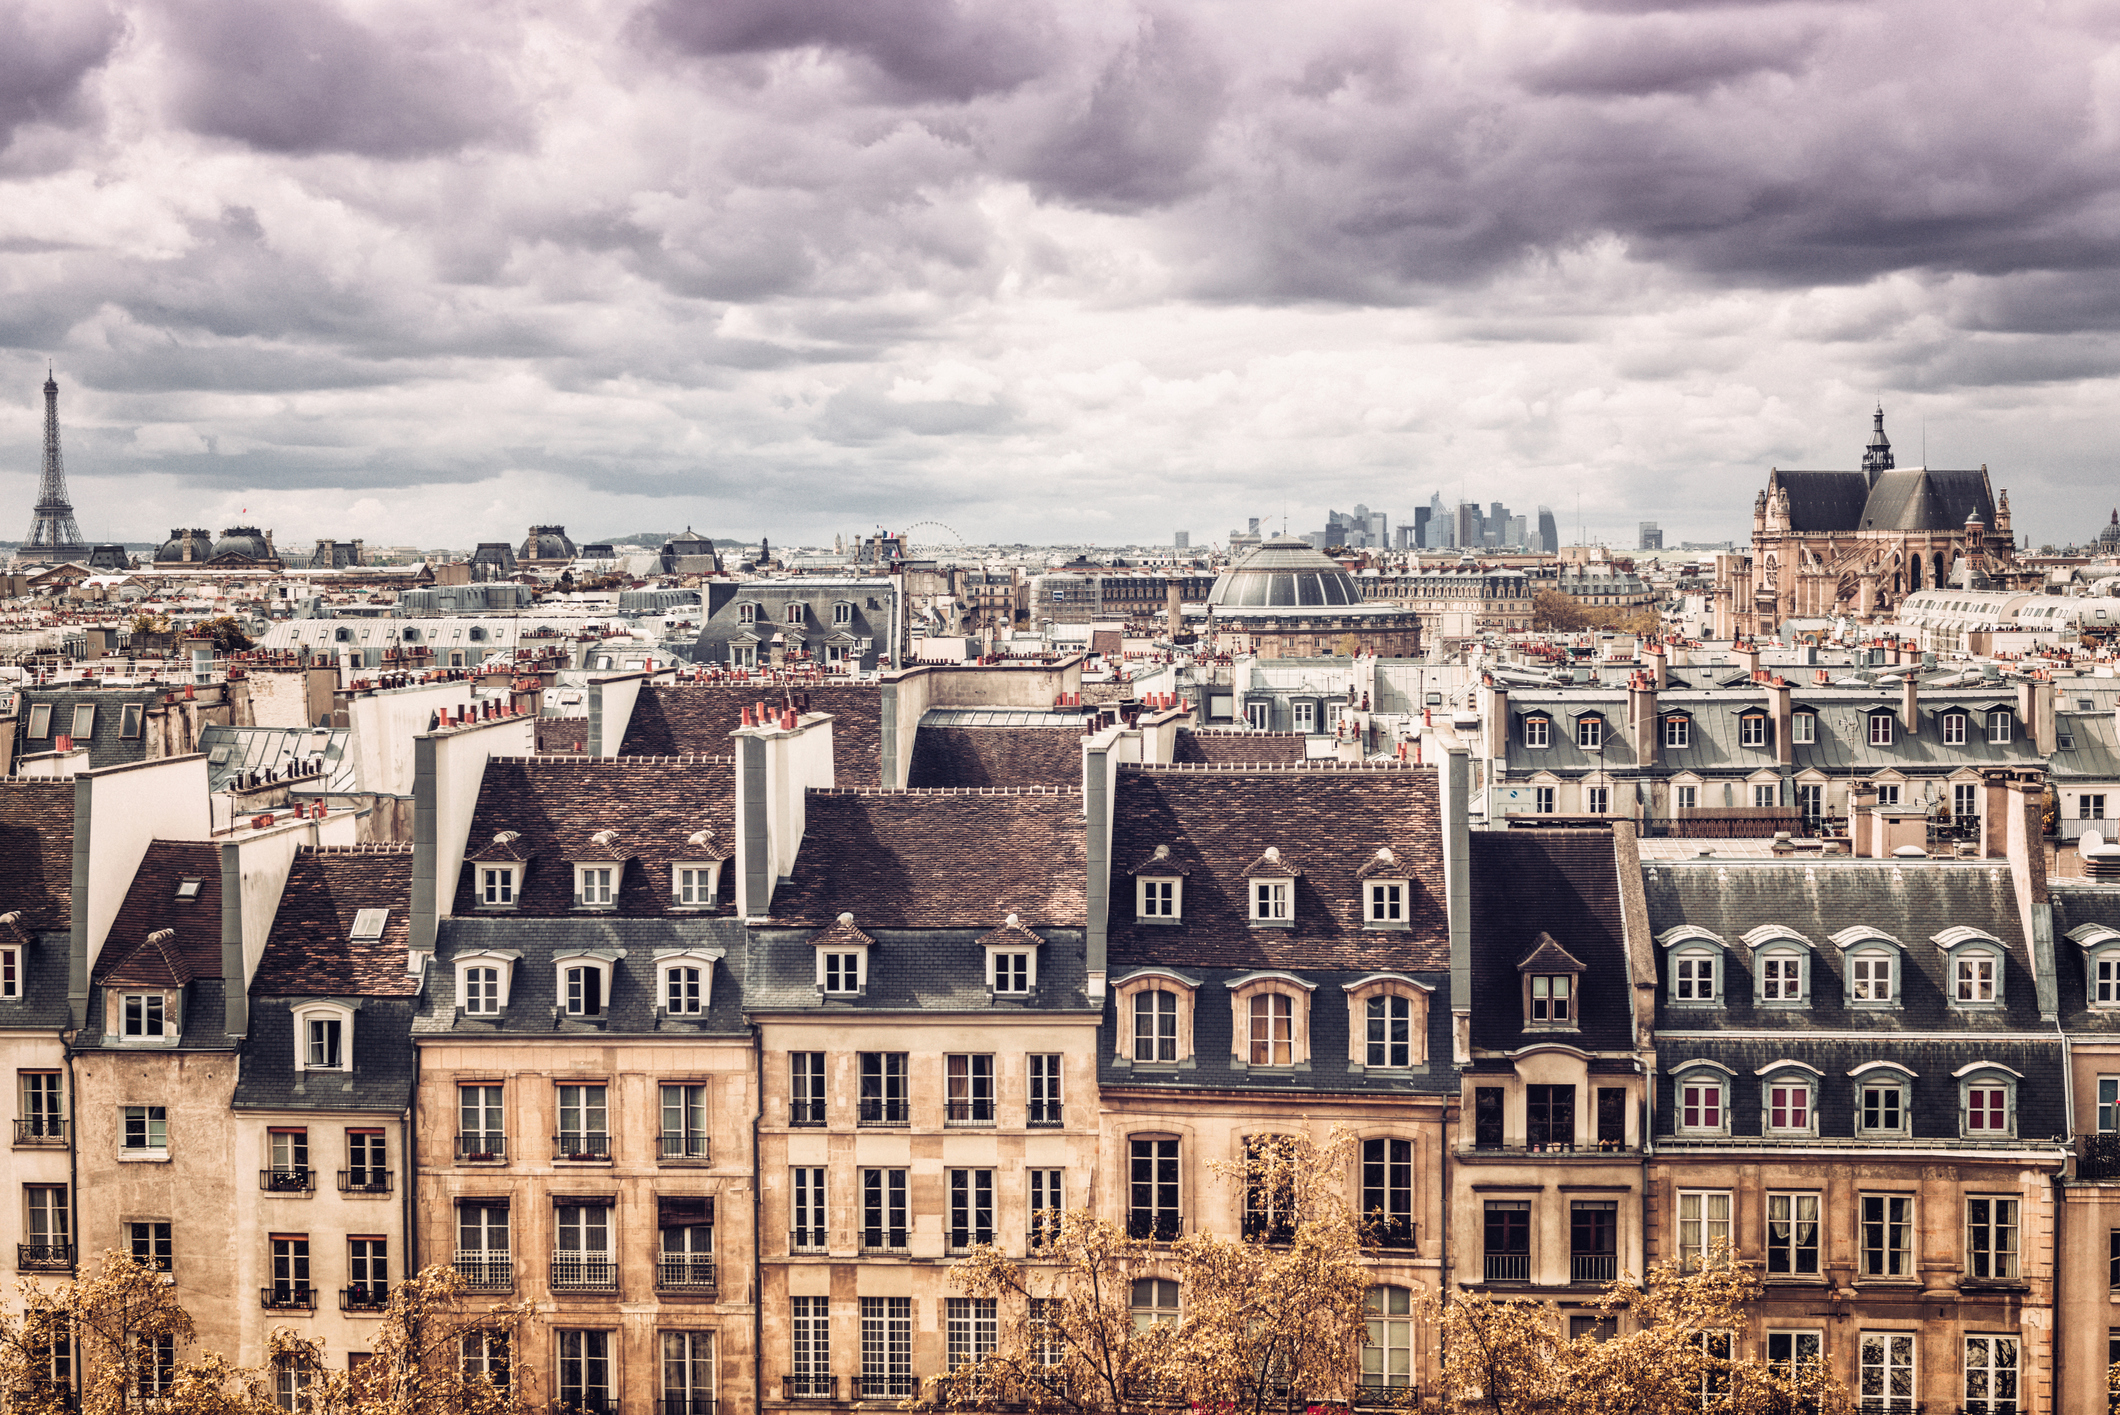 Parisian rooftops aiming for Unesco status